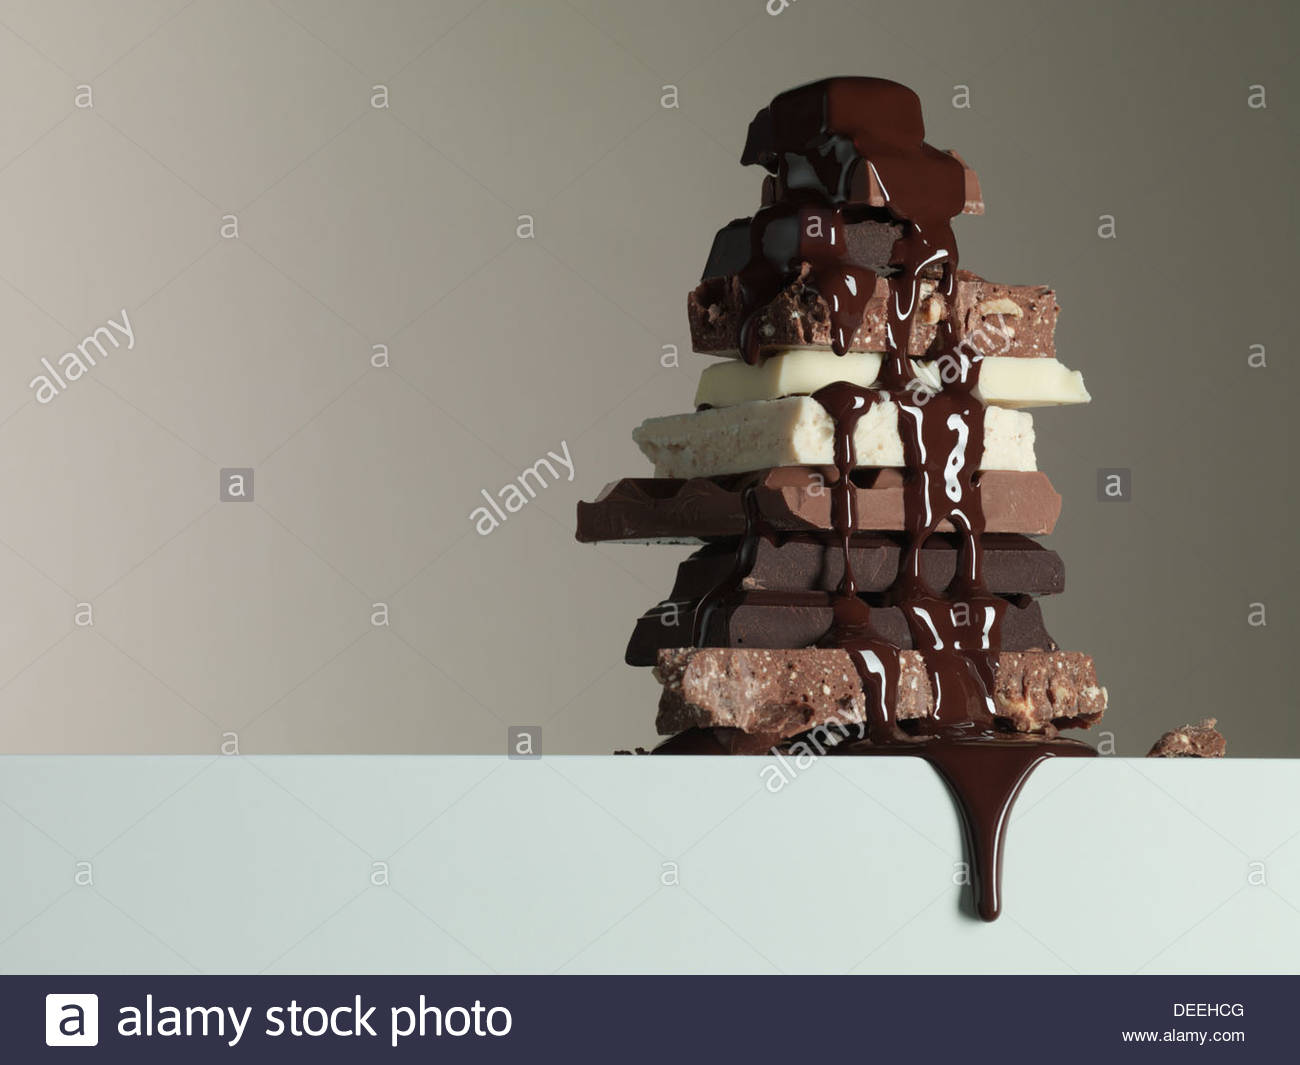 Sirop de chocolat dégoulinant sur pile de barres de chocolat Photo Stock